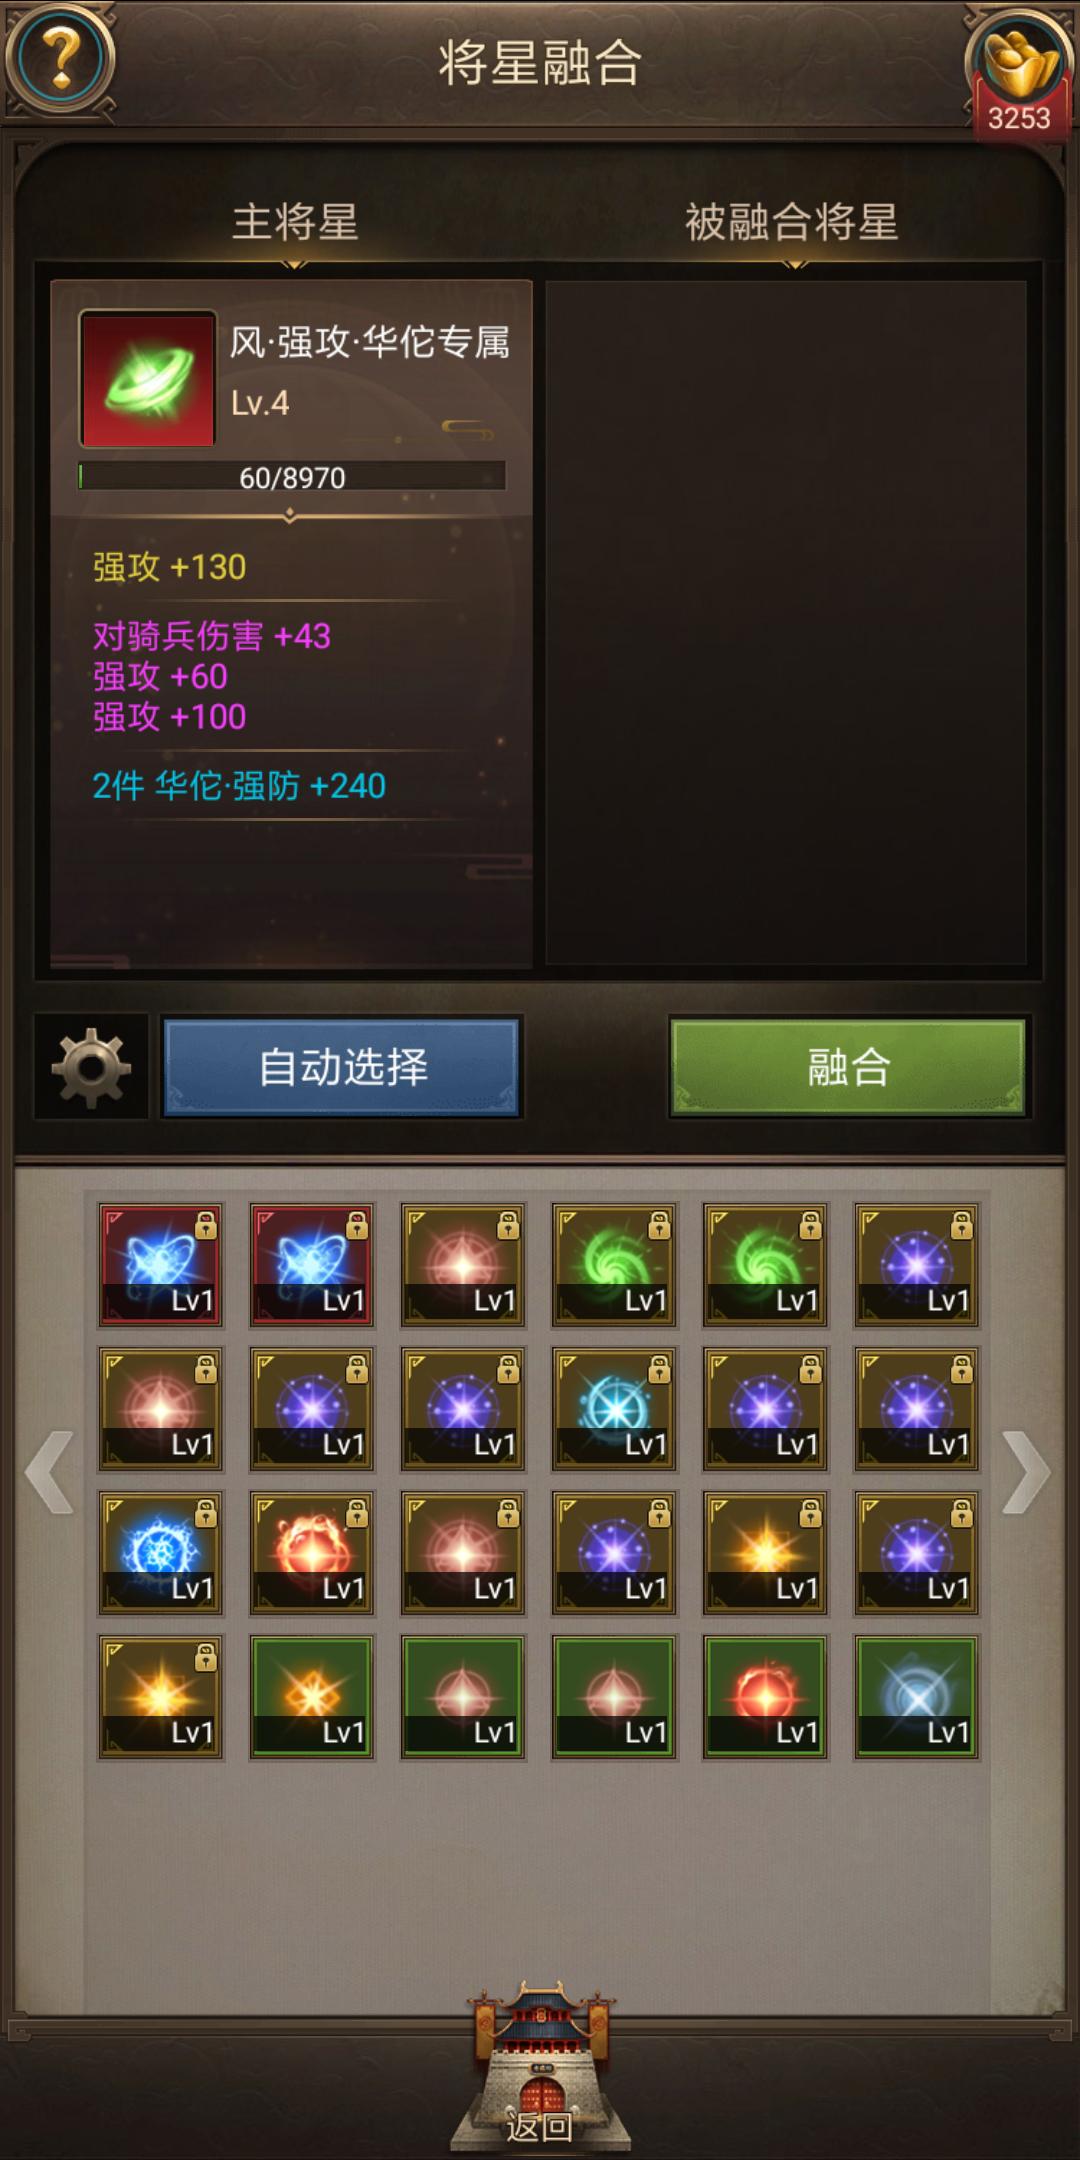 Screenshot_2019-12-11-08-49-46-505_com.jedigames.p16.mi.png